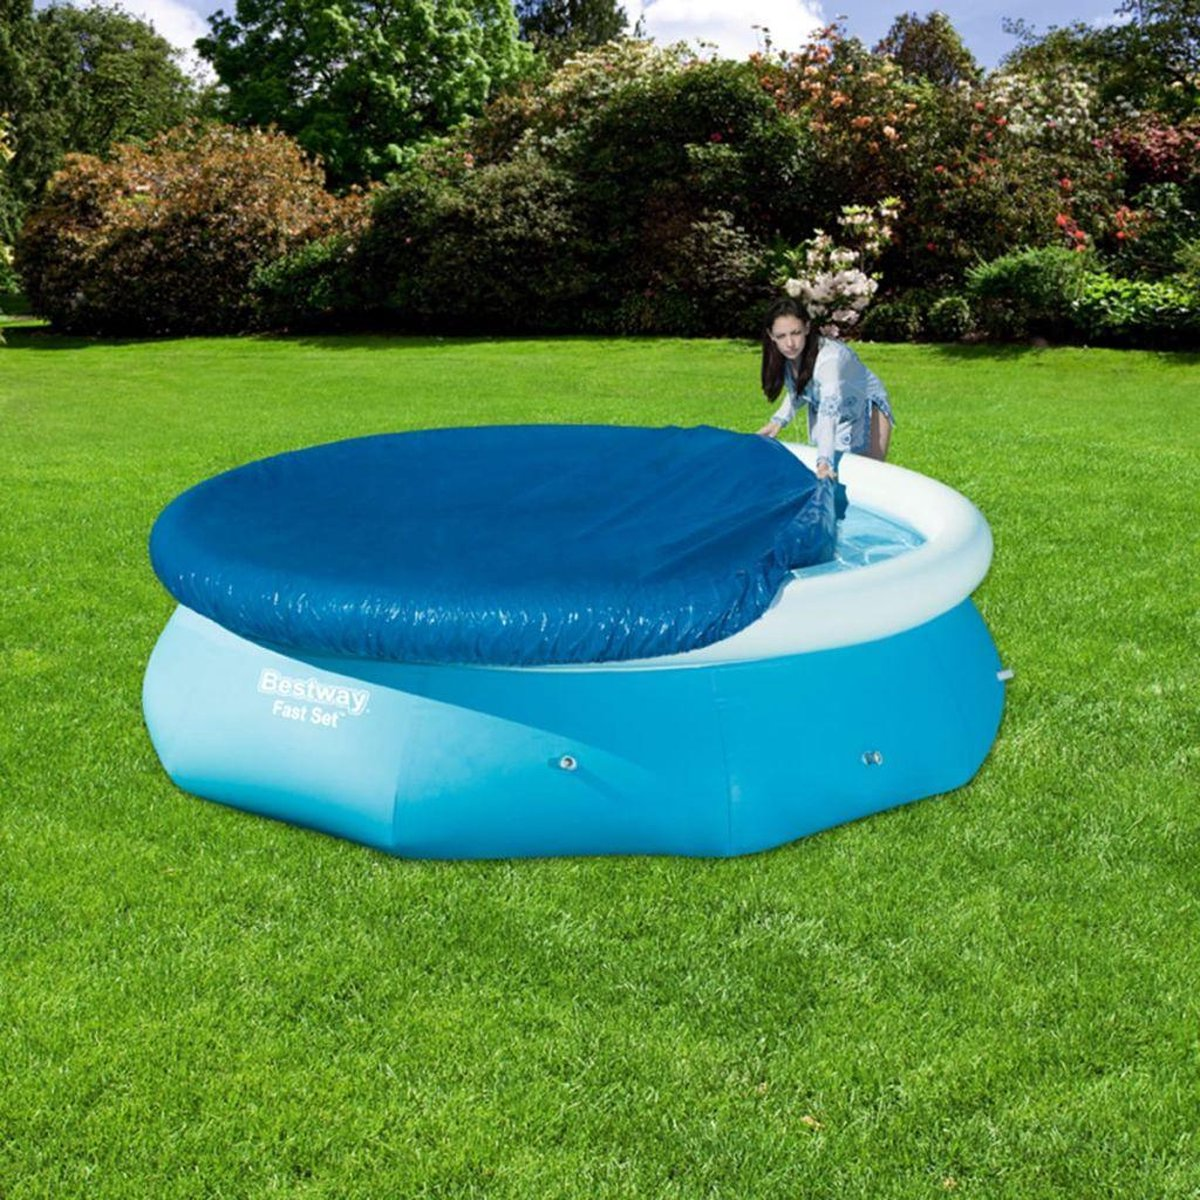 Zwembad afdekhoes - Ø 305 cm